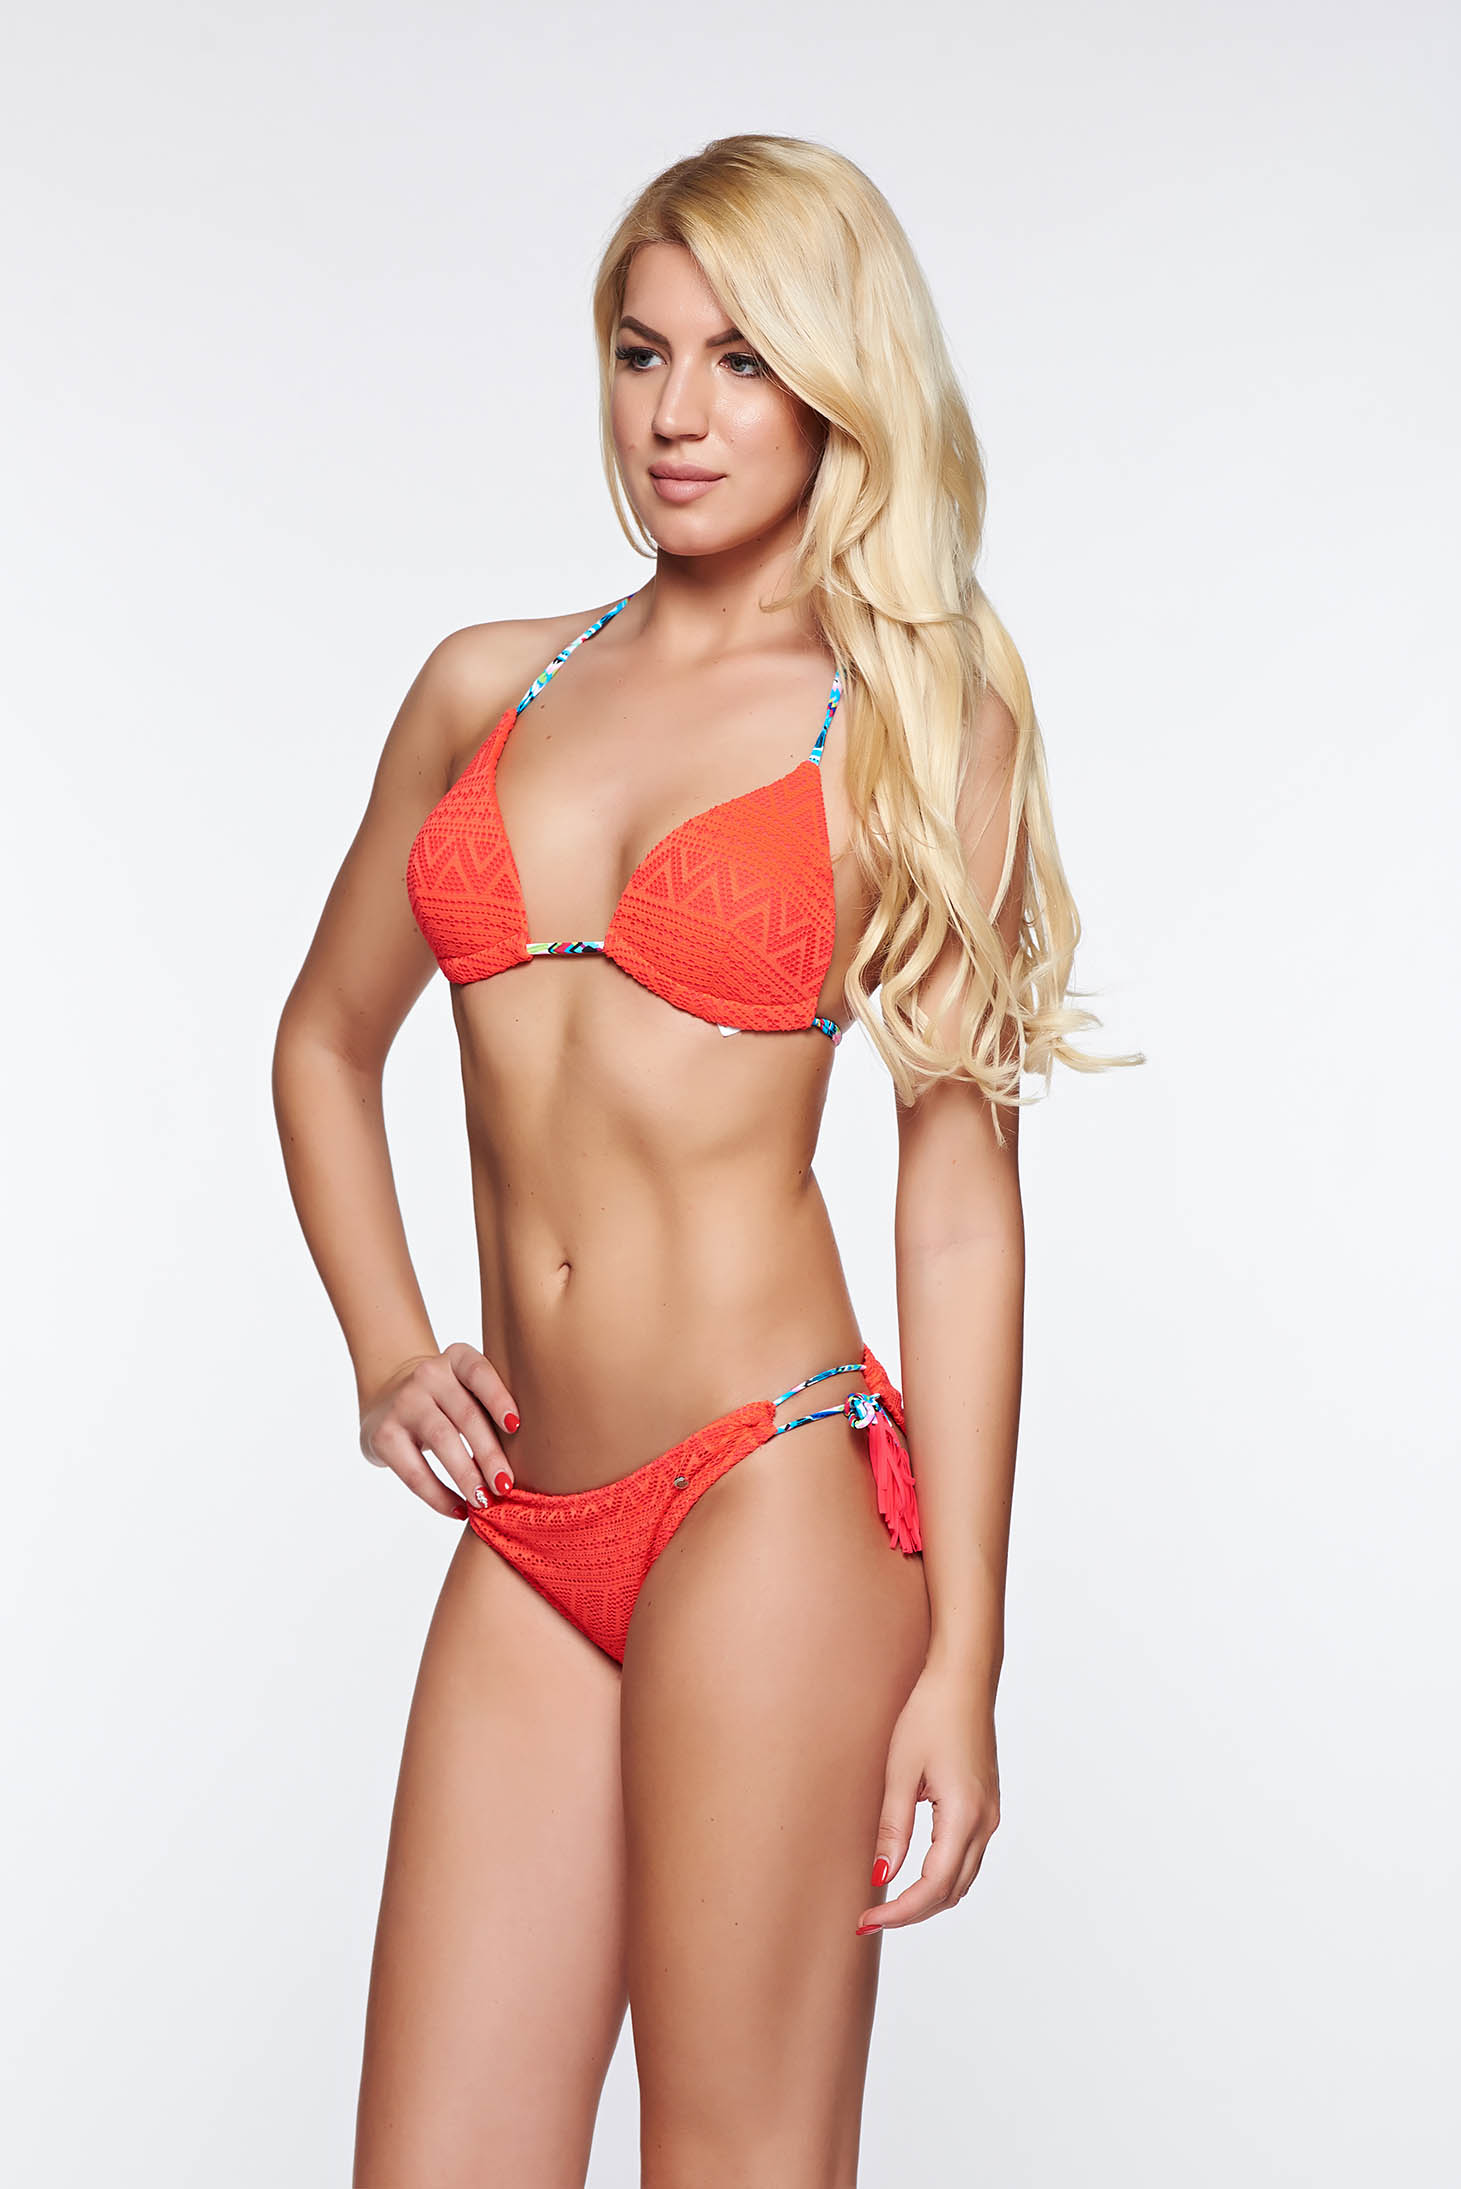 ea46b93489 Top Secret red bathing bikini with classical slip adjustable bikinis with  ...